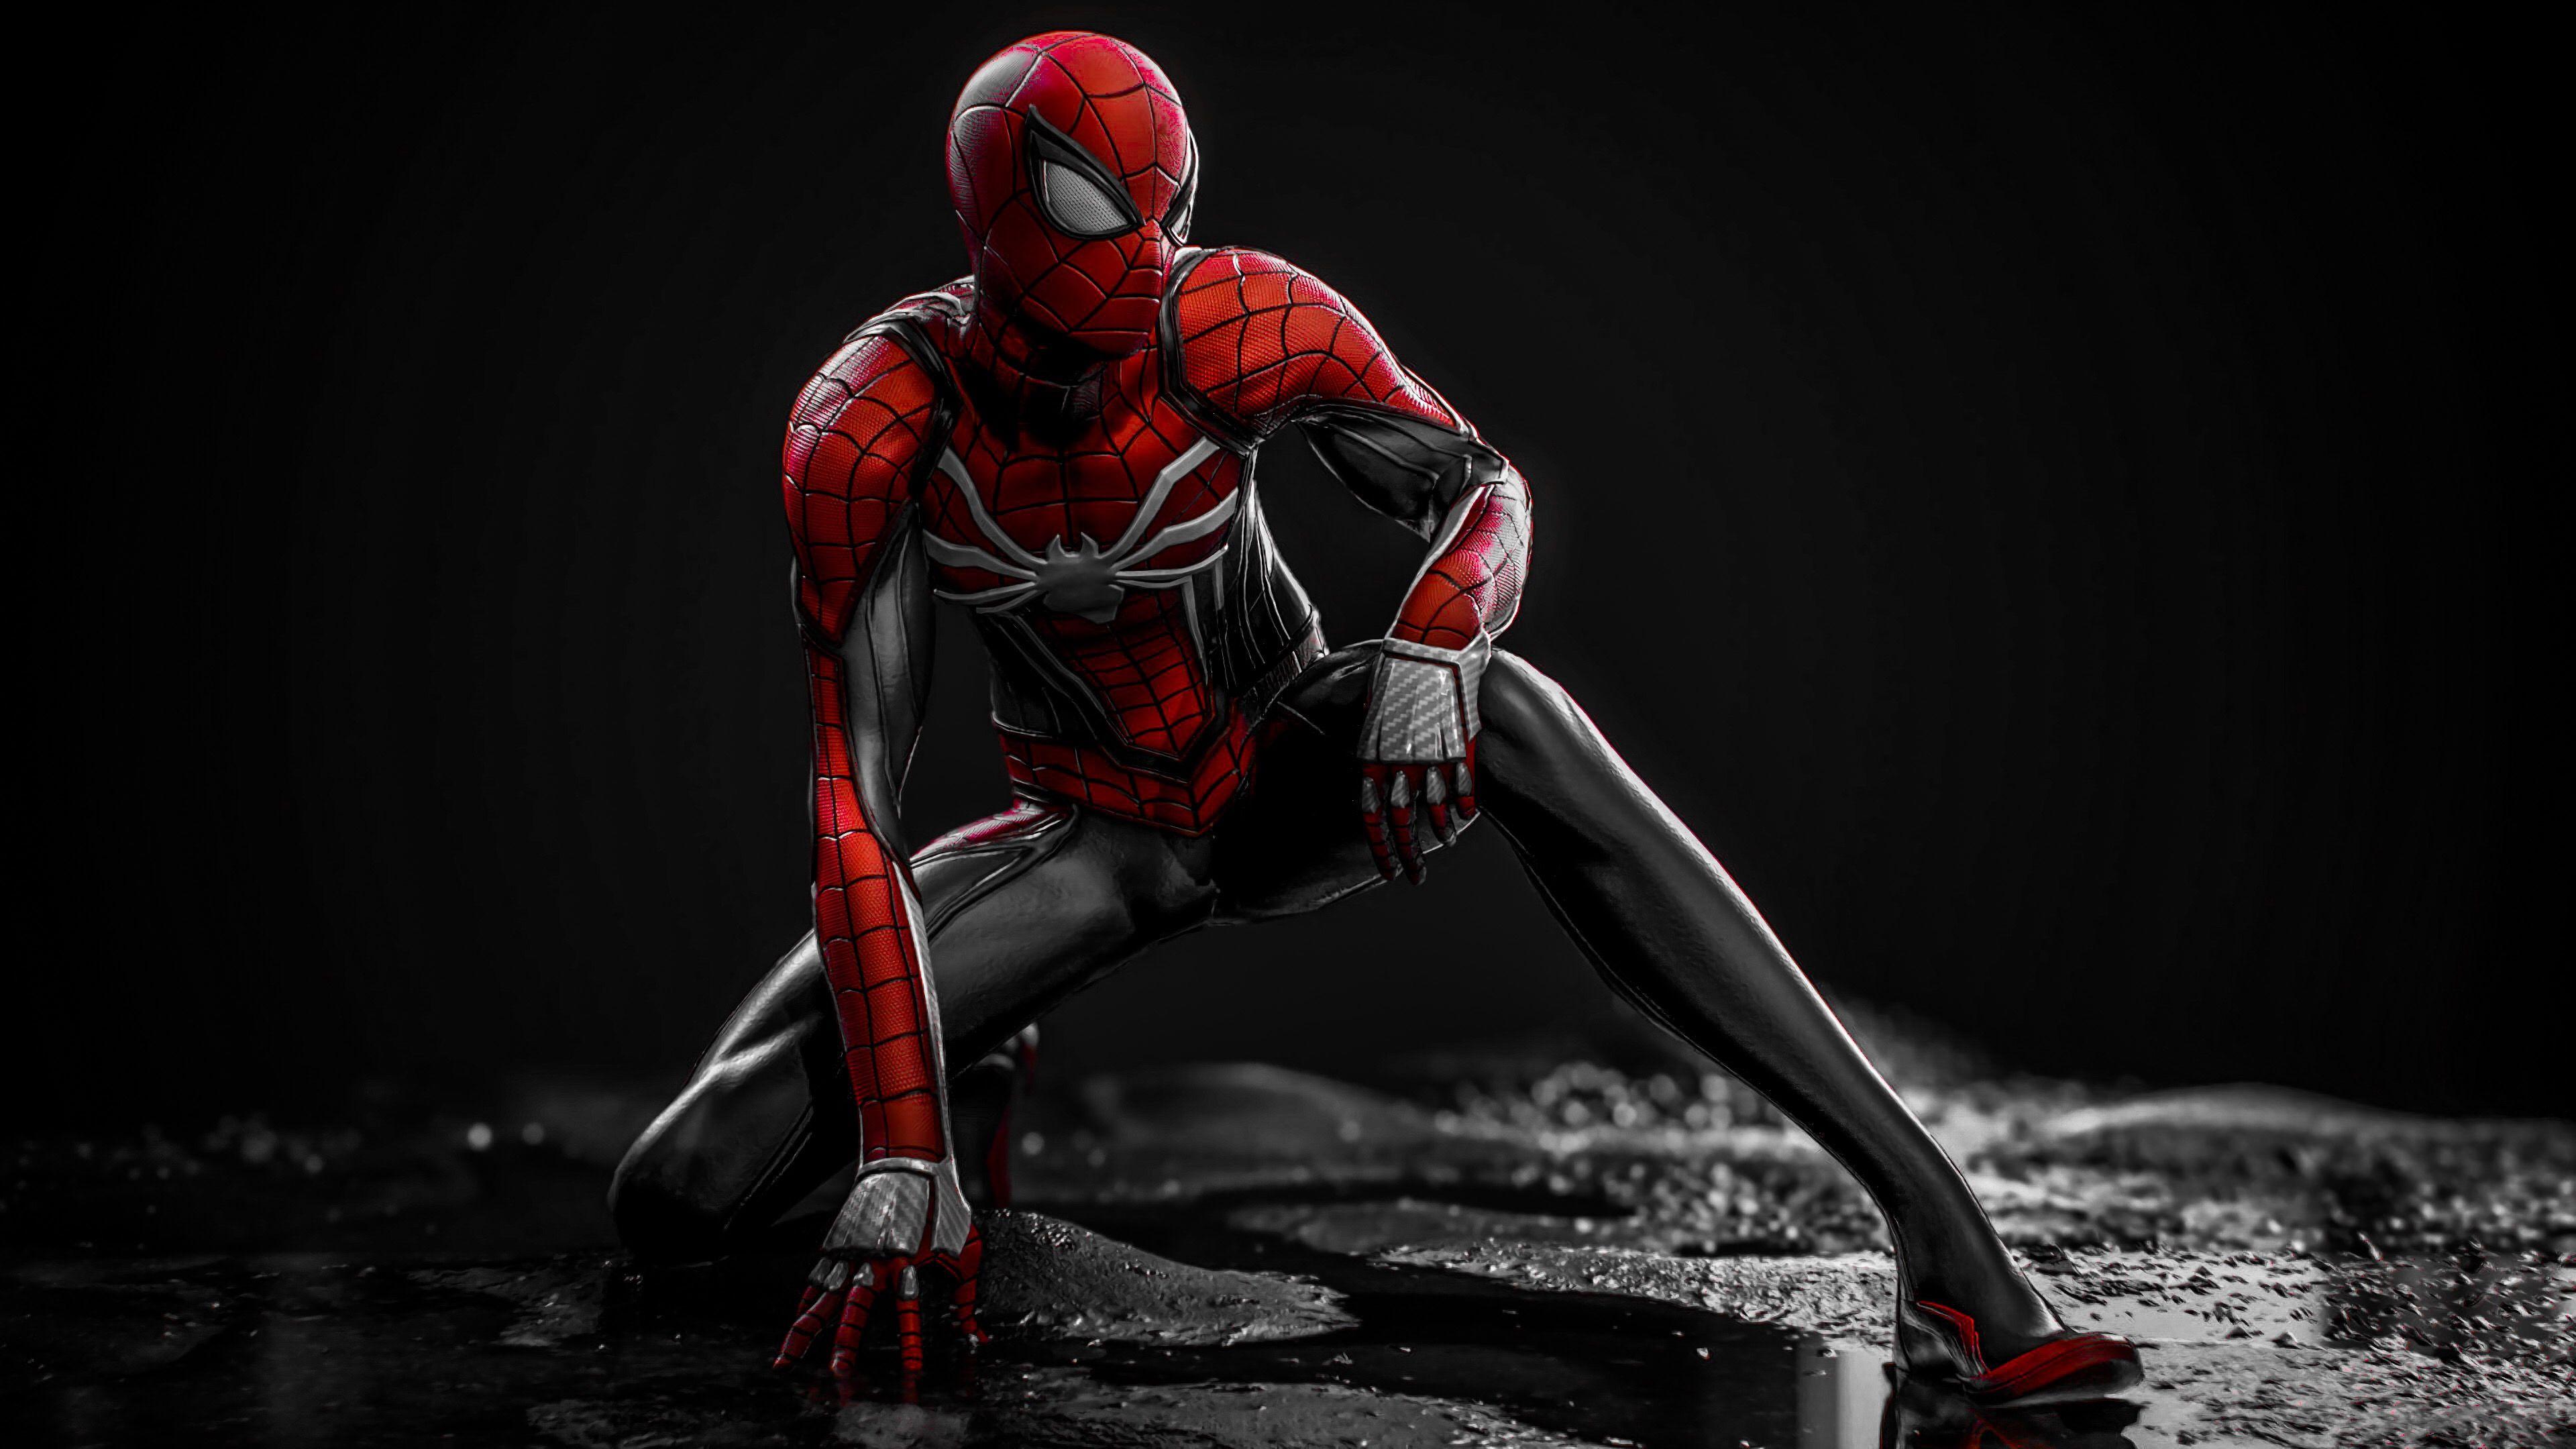 Spiderman PS4 red edit 3 Hombre araña comic, Amazing